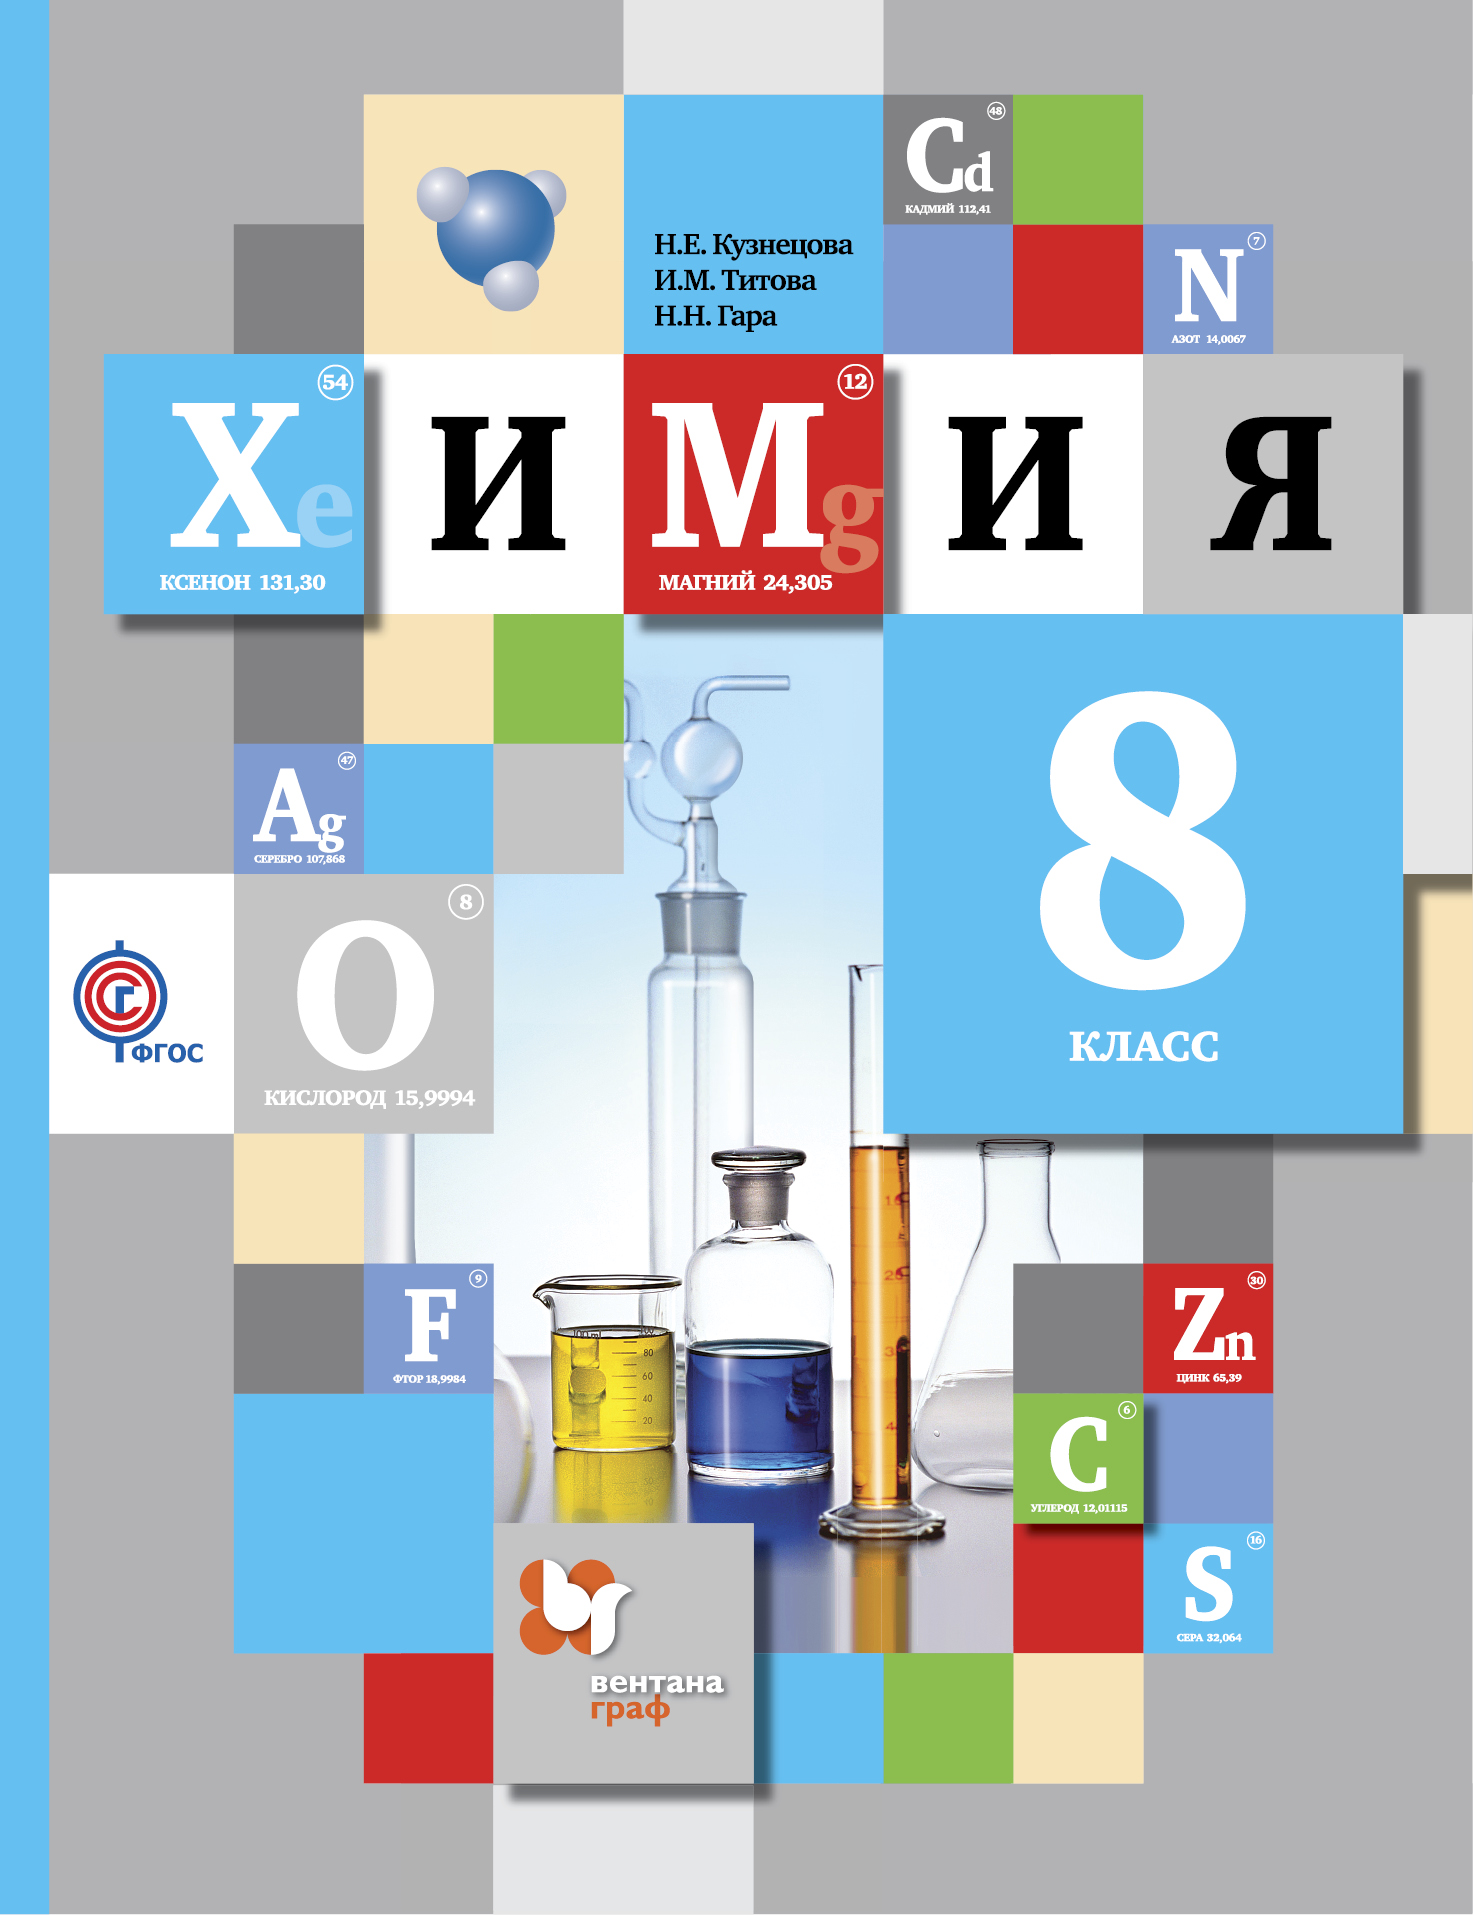 Н химия е кузнецовой решебник